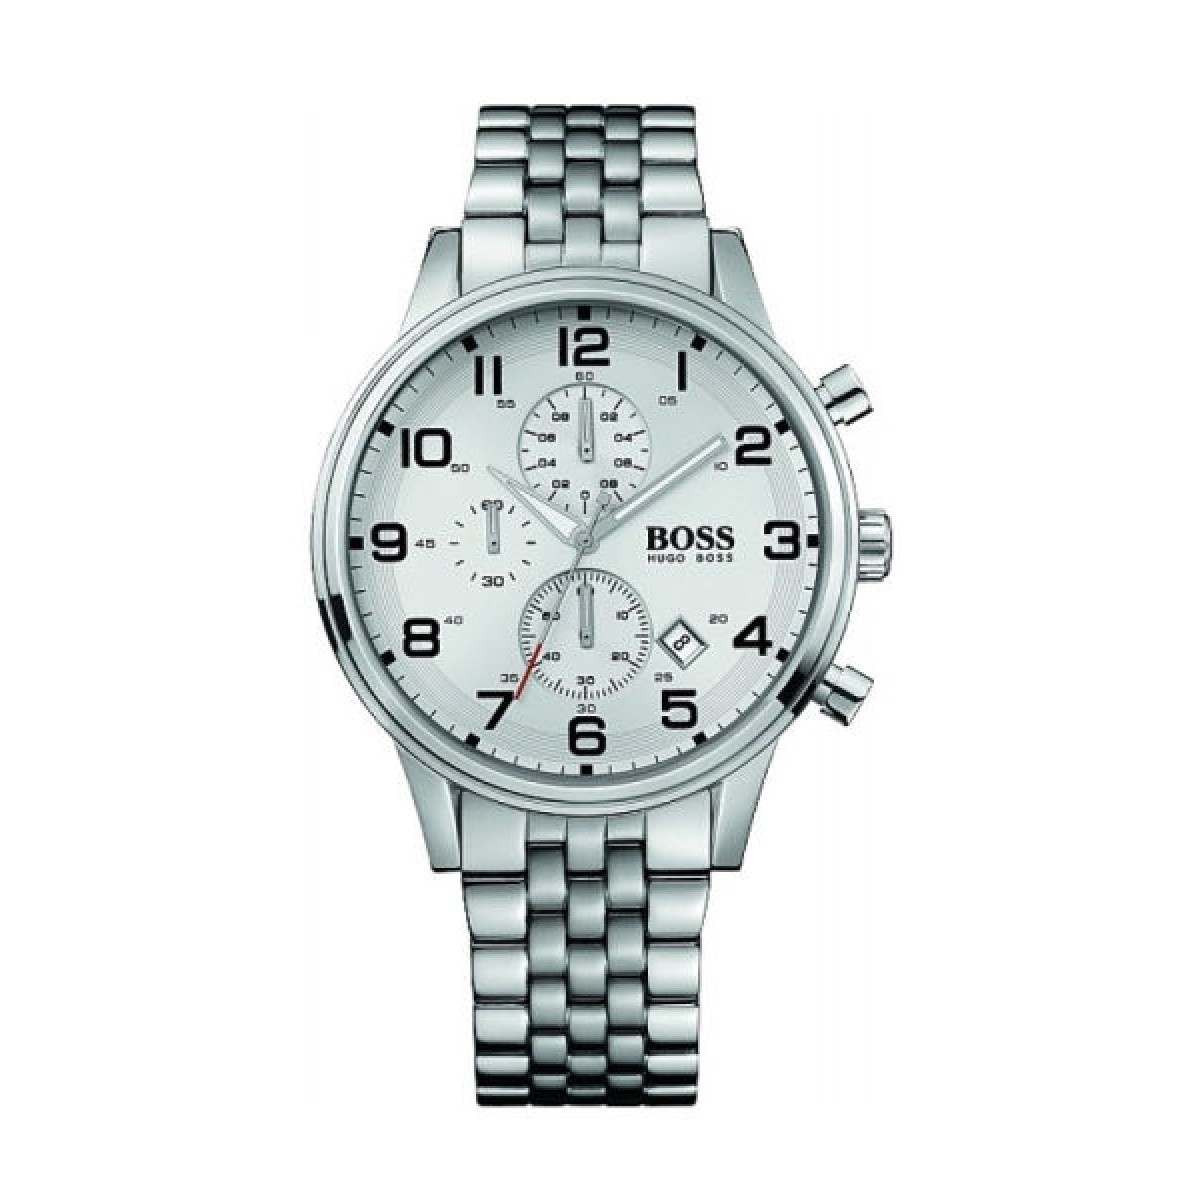 9db056d97da Hugo Boss HB1512445 Herenhorloge - tot 65% korting| Wowwatch.nl